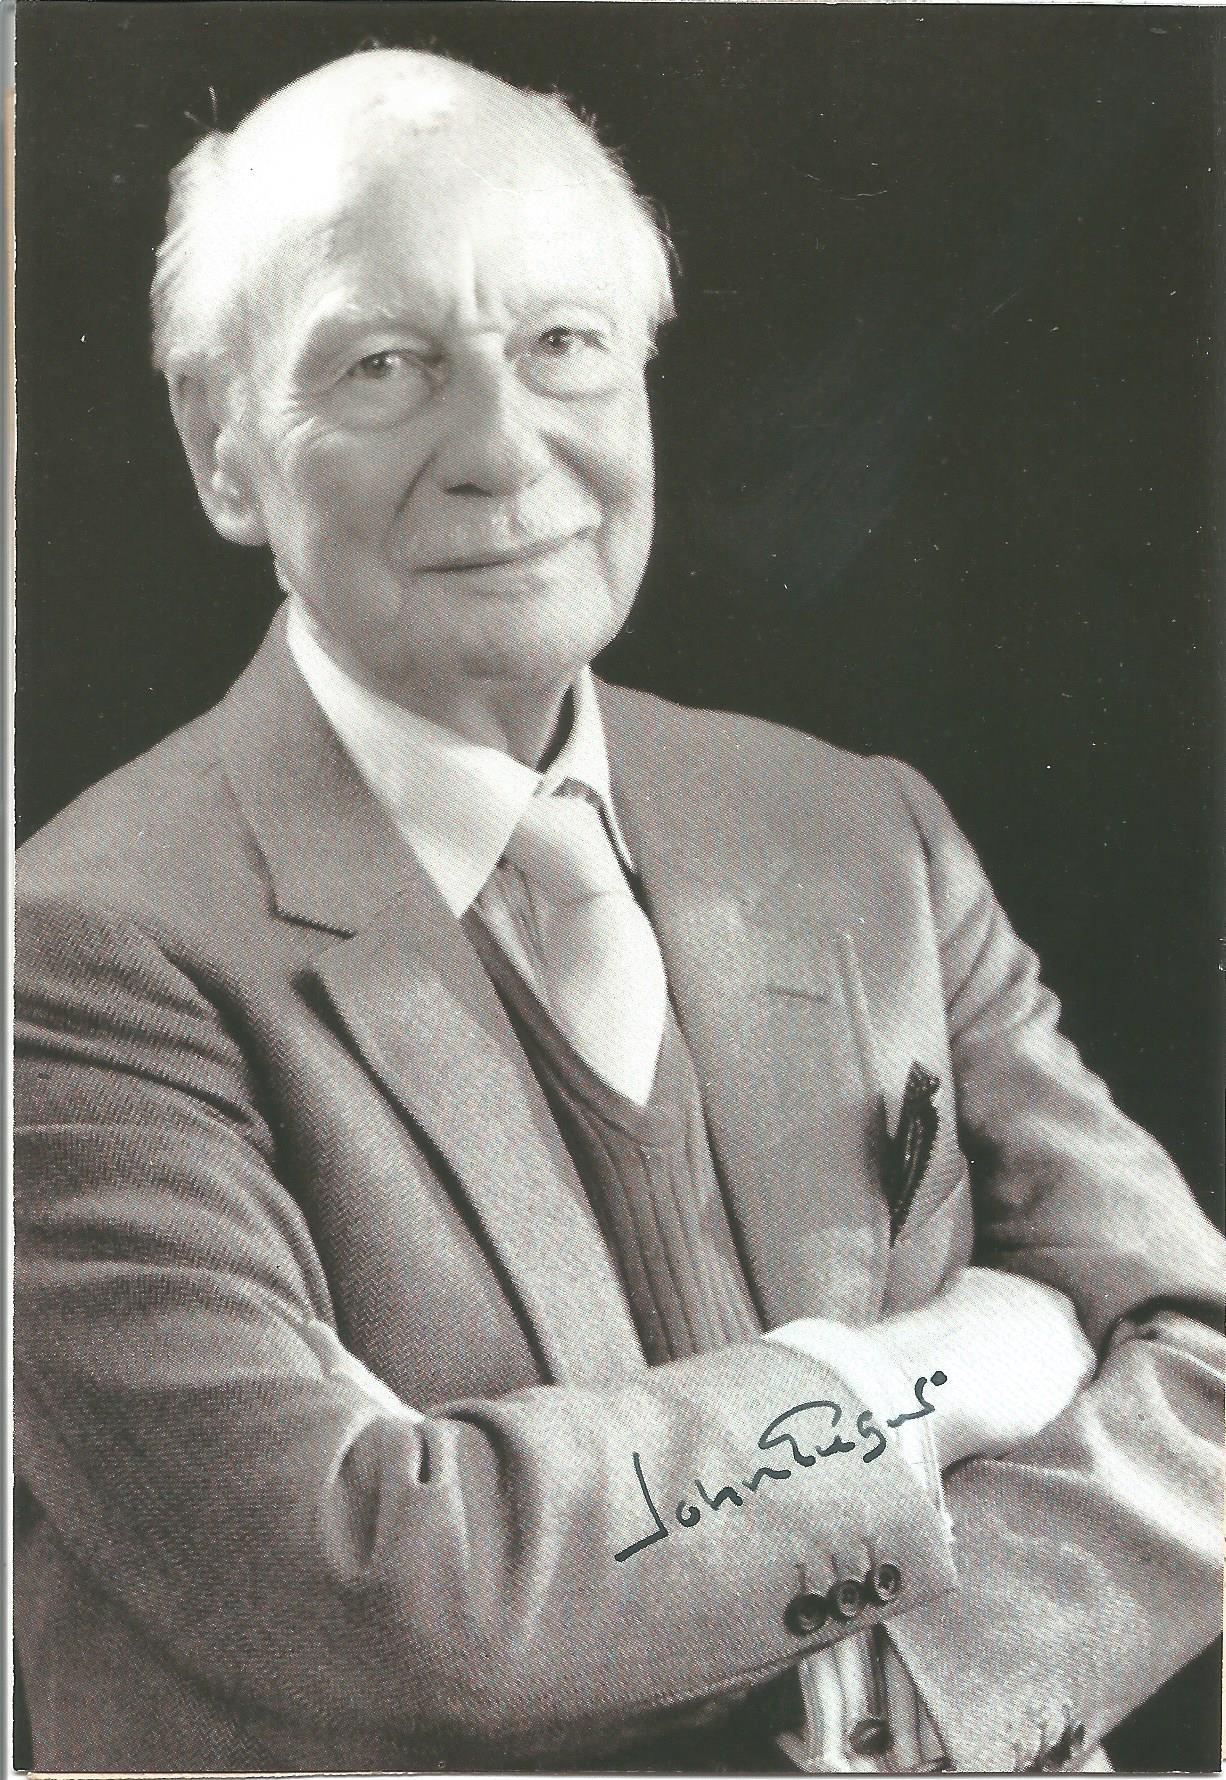 Actor John Gielgud signed 6x4 black and white photo. Sir Arthur John Gielgud, OM, CH was an